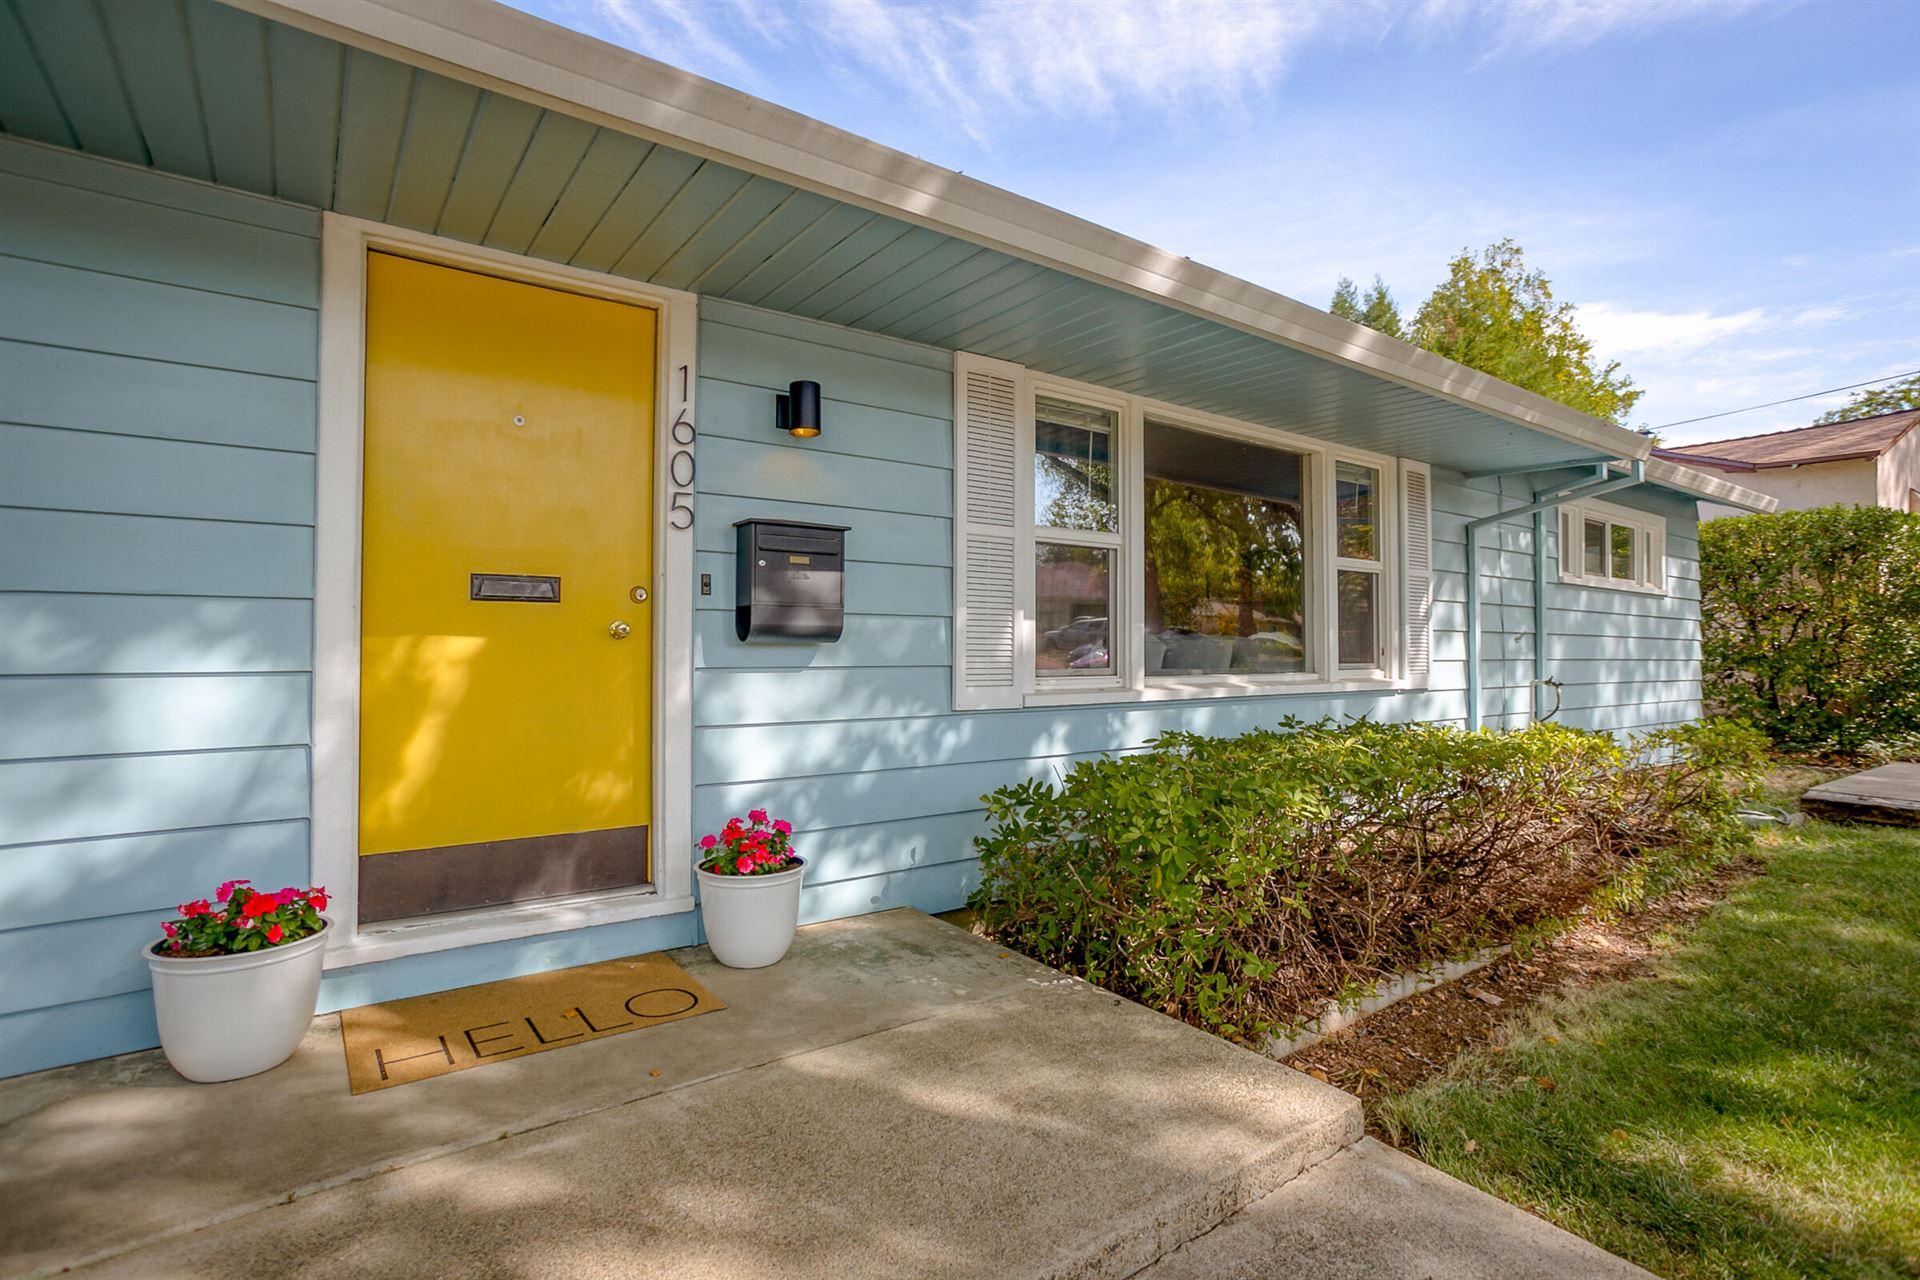 Photo of 1605 Verda St, Redding, CA 96001 (MLS # 21-4791)